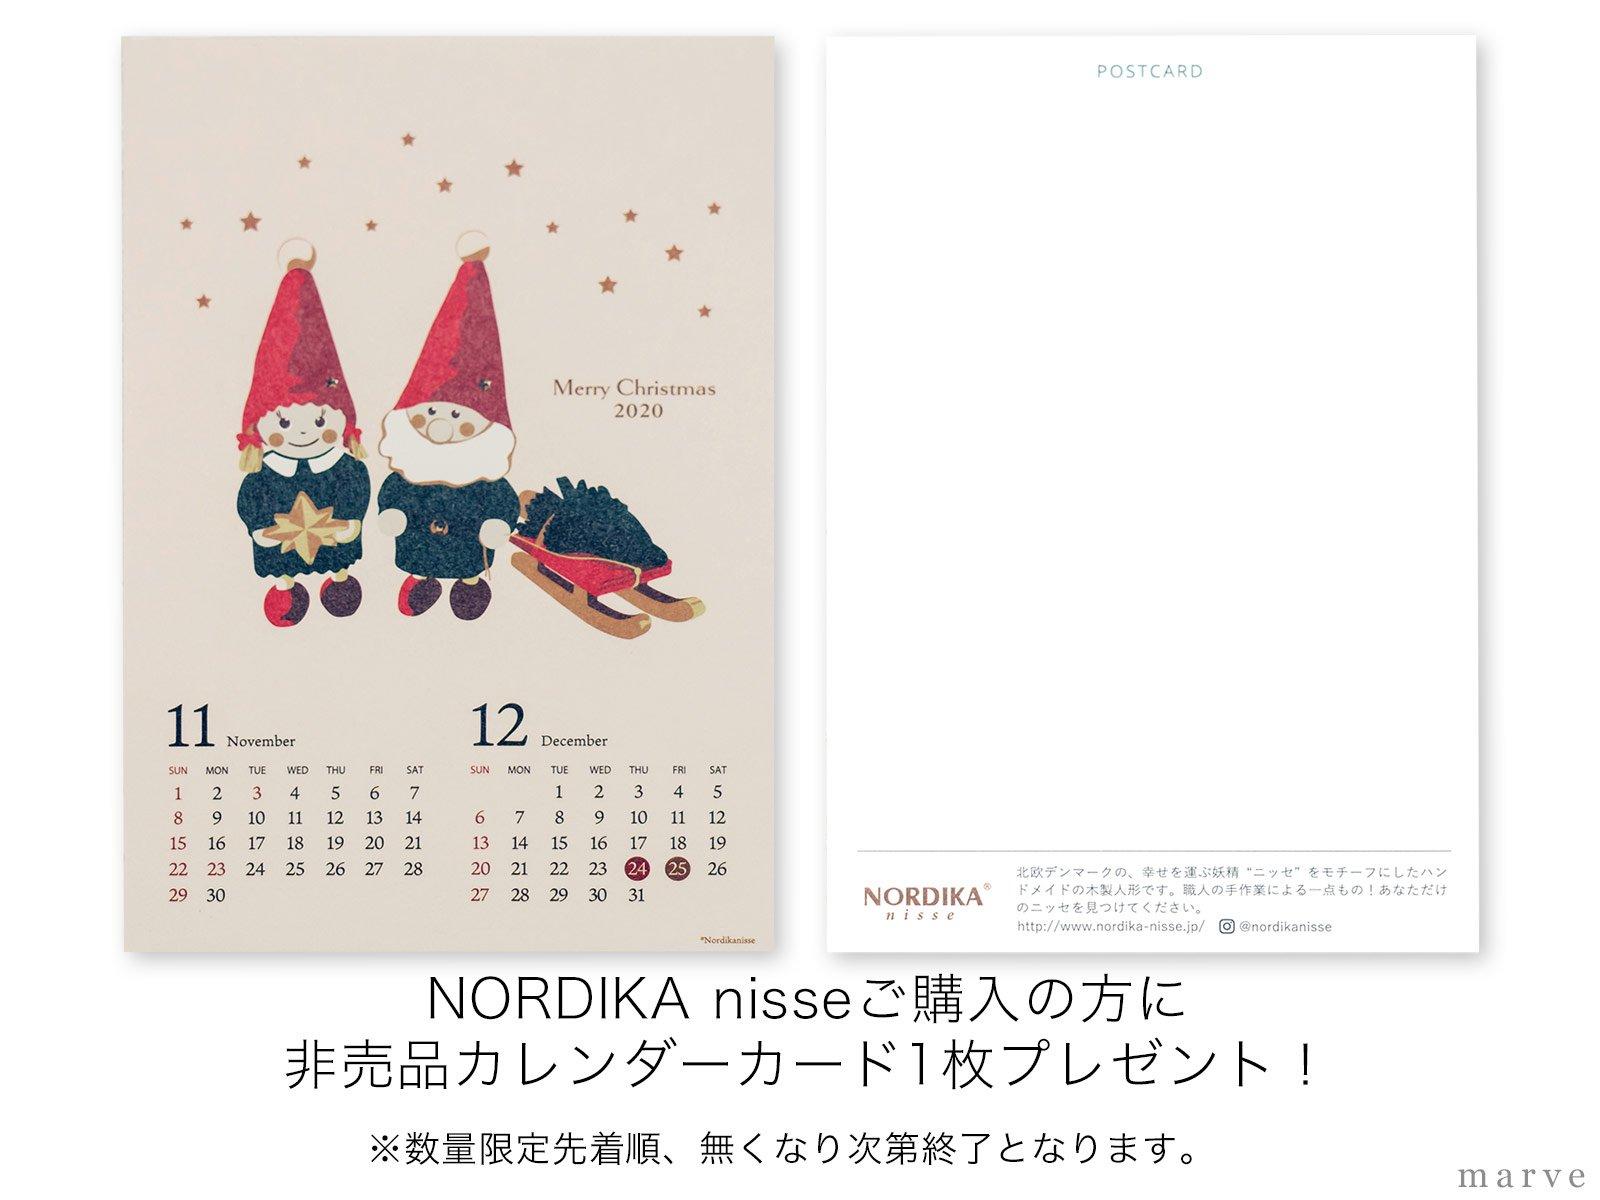 NORDIKA design ニッセドール 「大きい靴下を持ったサンタ ホーム」<img class='new_mark_img2' src='https://img.shop-pro.jp/img/new/icons1.gif' style='border:none;display:inline;margin:0px;padding:0px;width:auto;' />